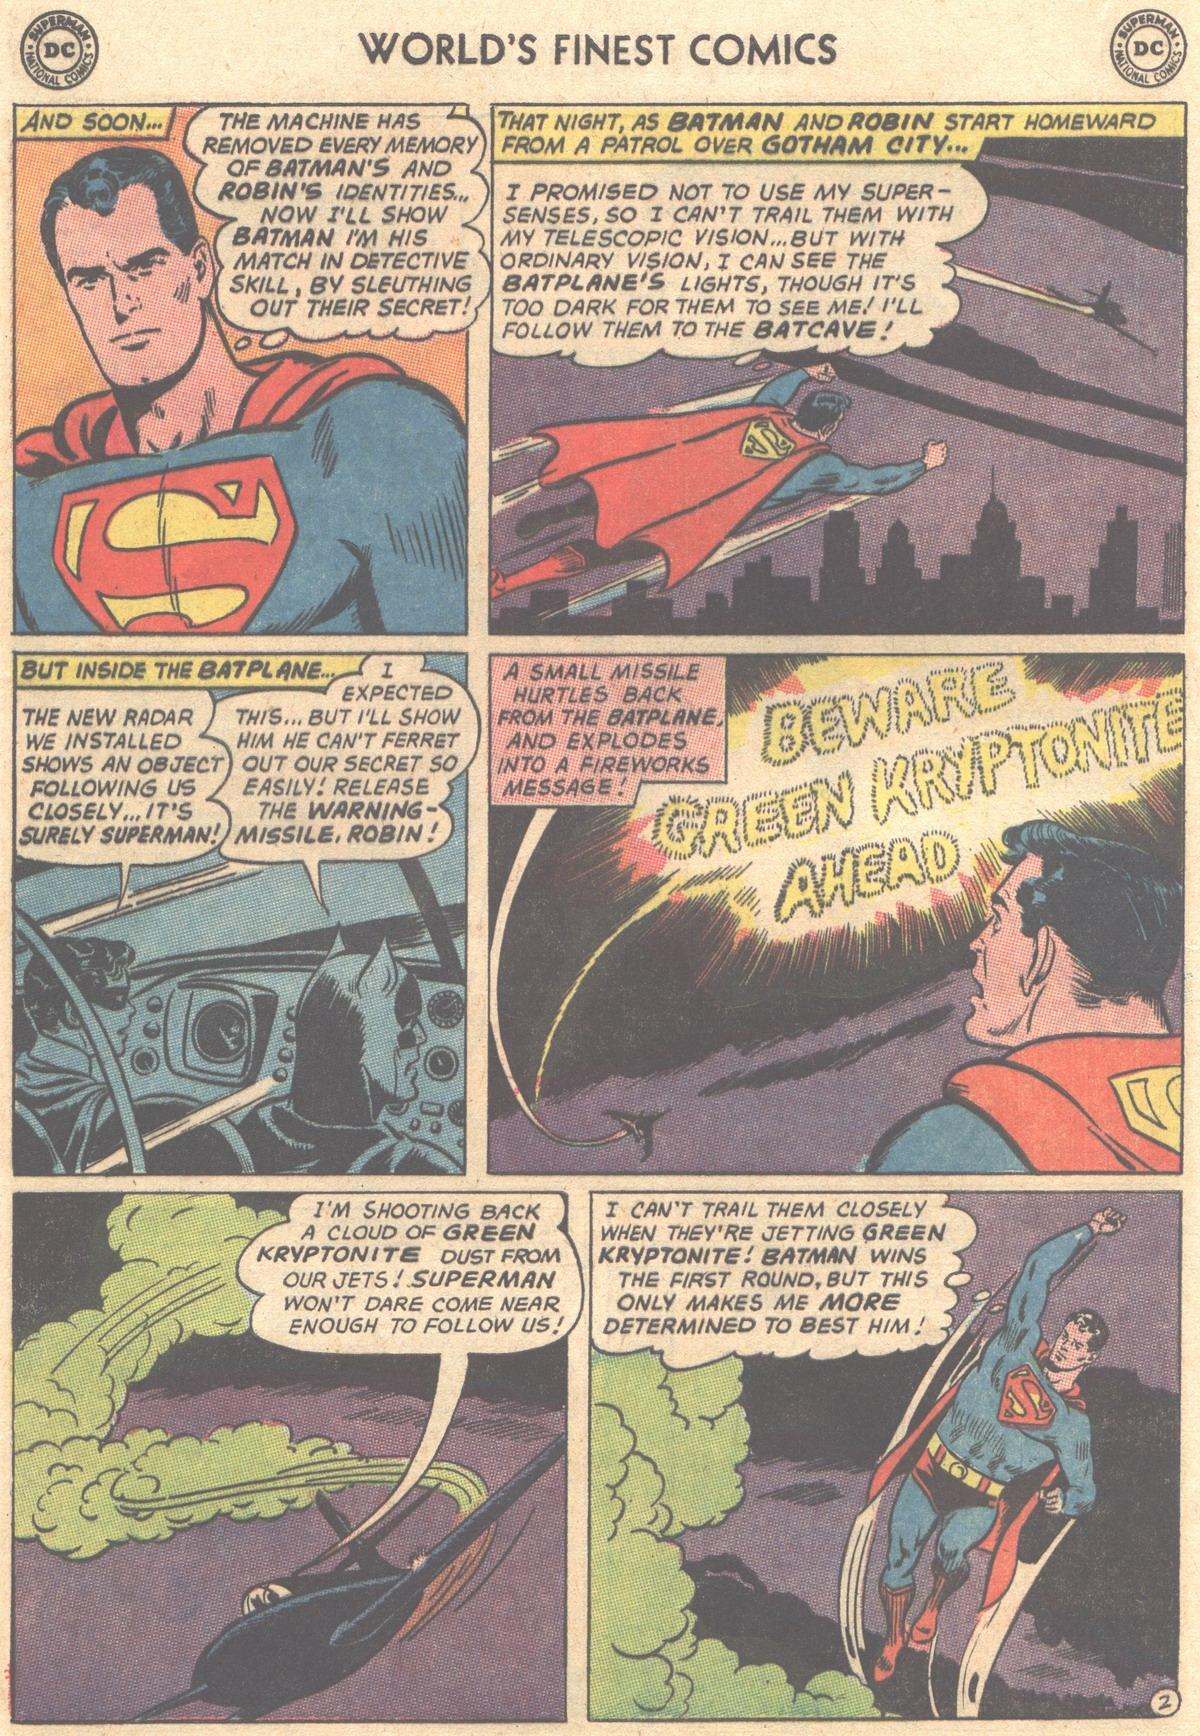 Read online World's Finest Comics comic -  Issue #149 - 16